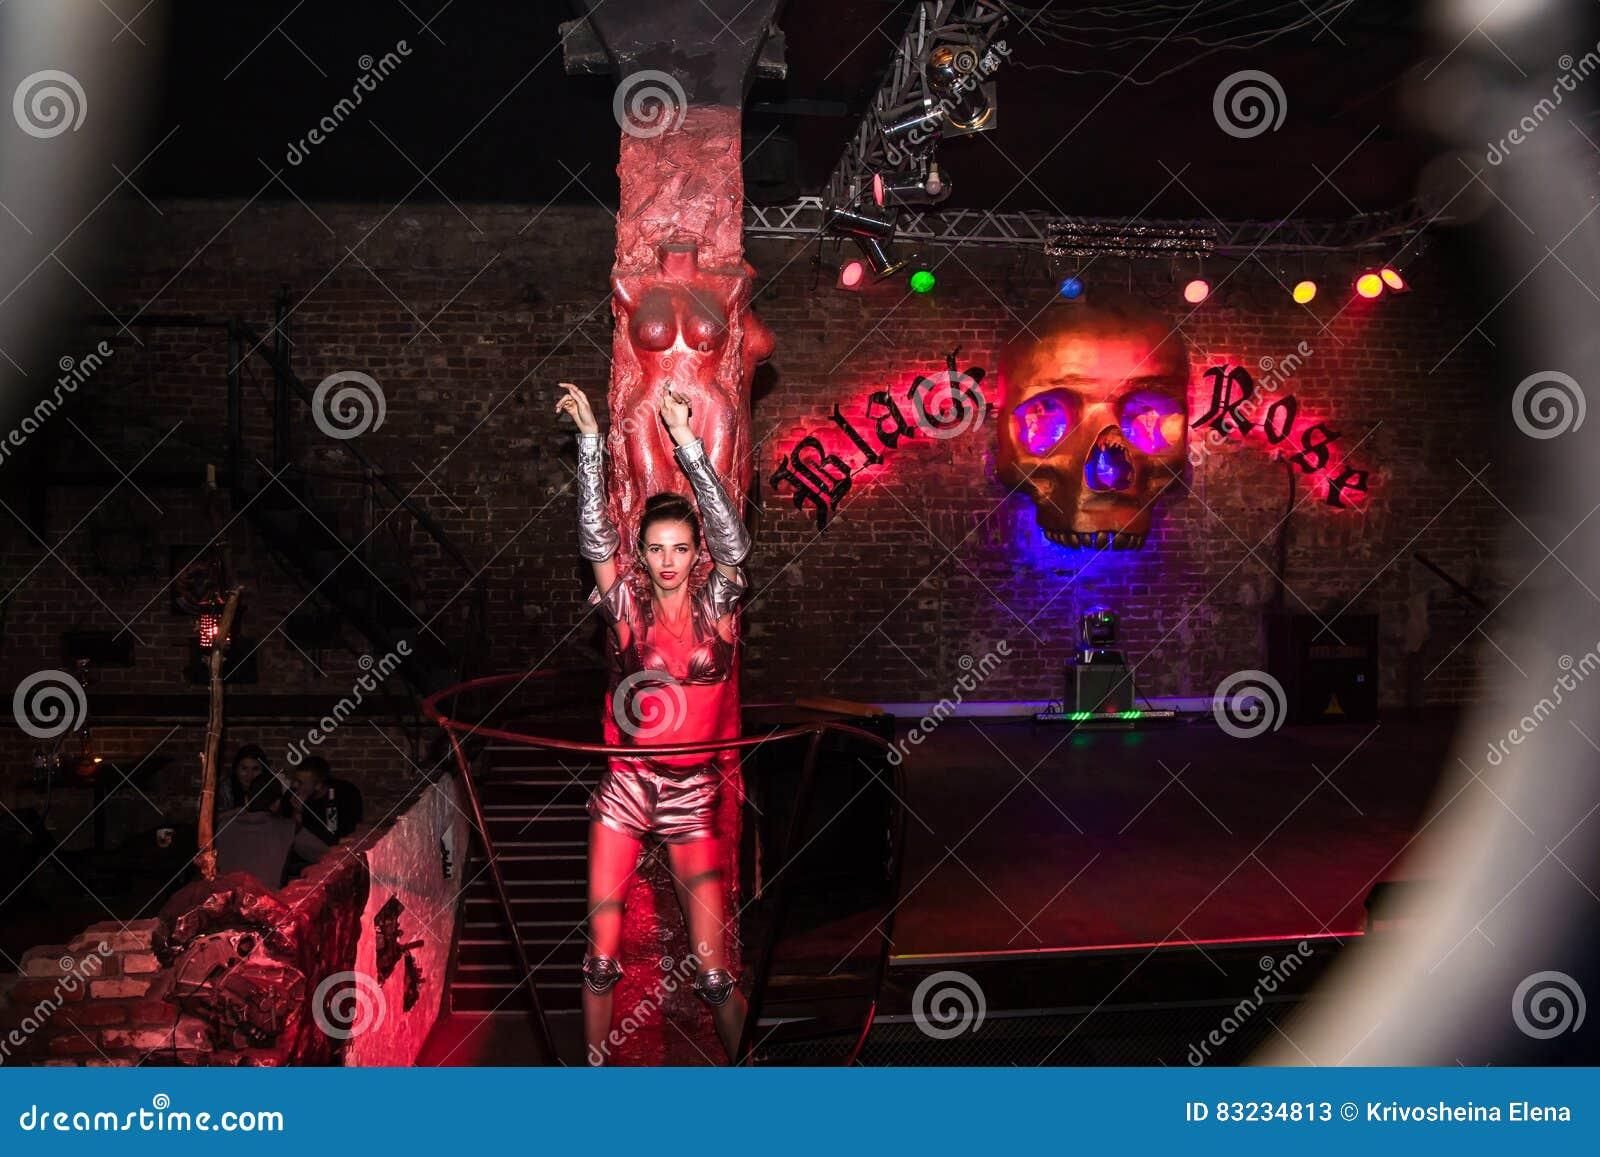 De manierprestaties art chaos in zwarte nachtclub namen in kirov toe redactionele stock foto - Nachtclub decoratie ...